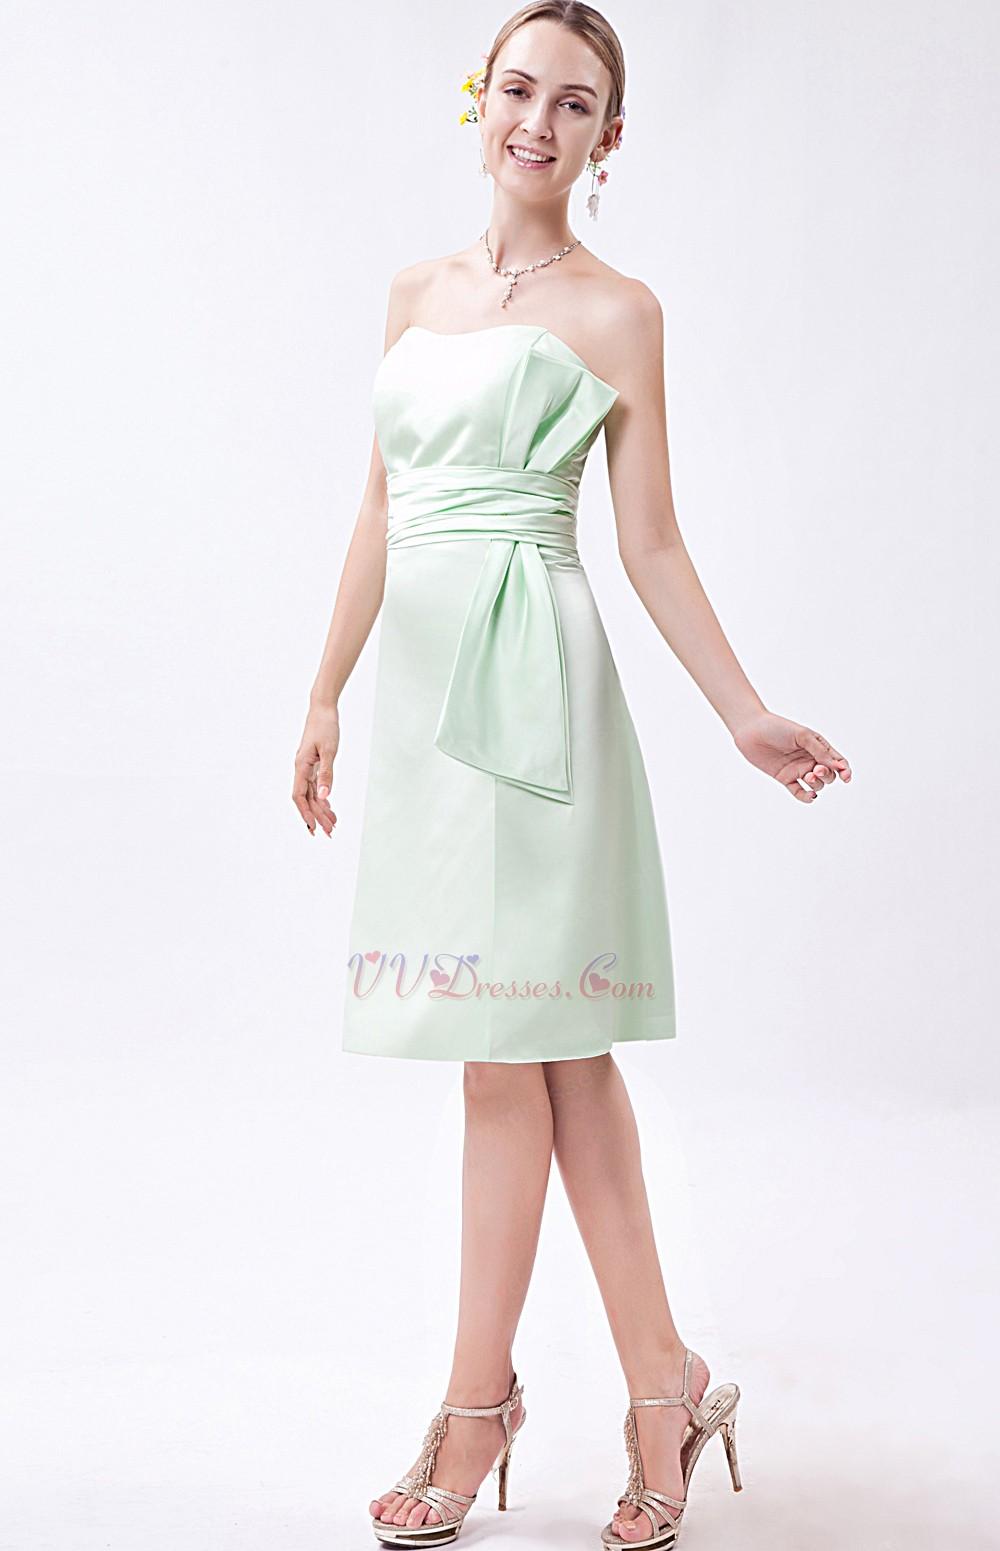 wholesale wedding party dresses